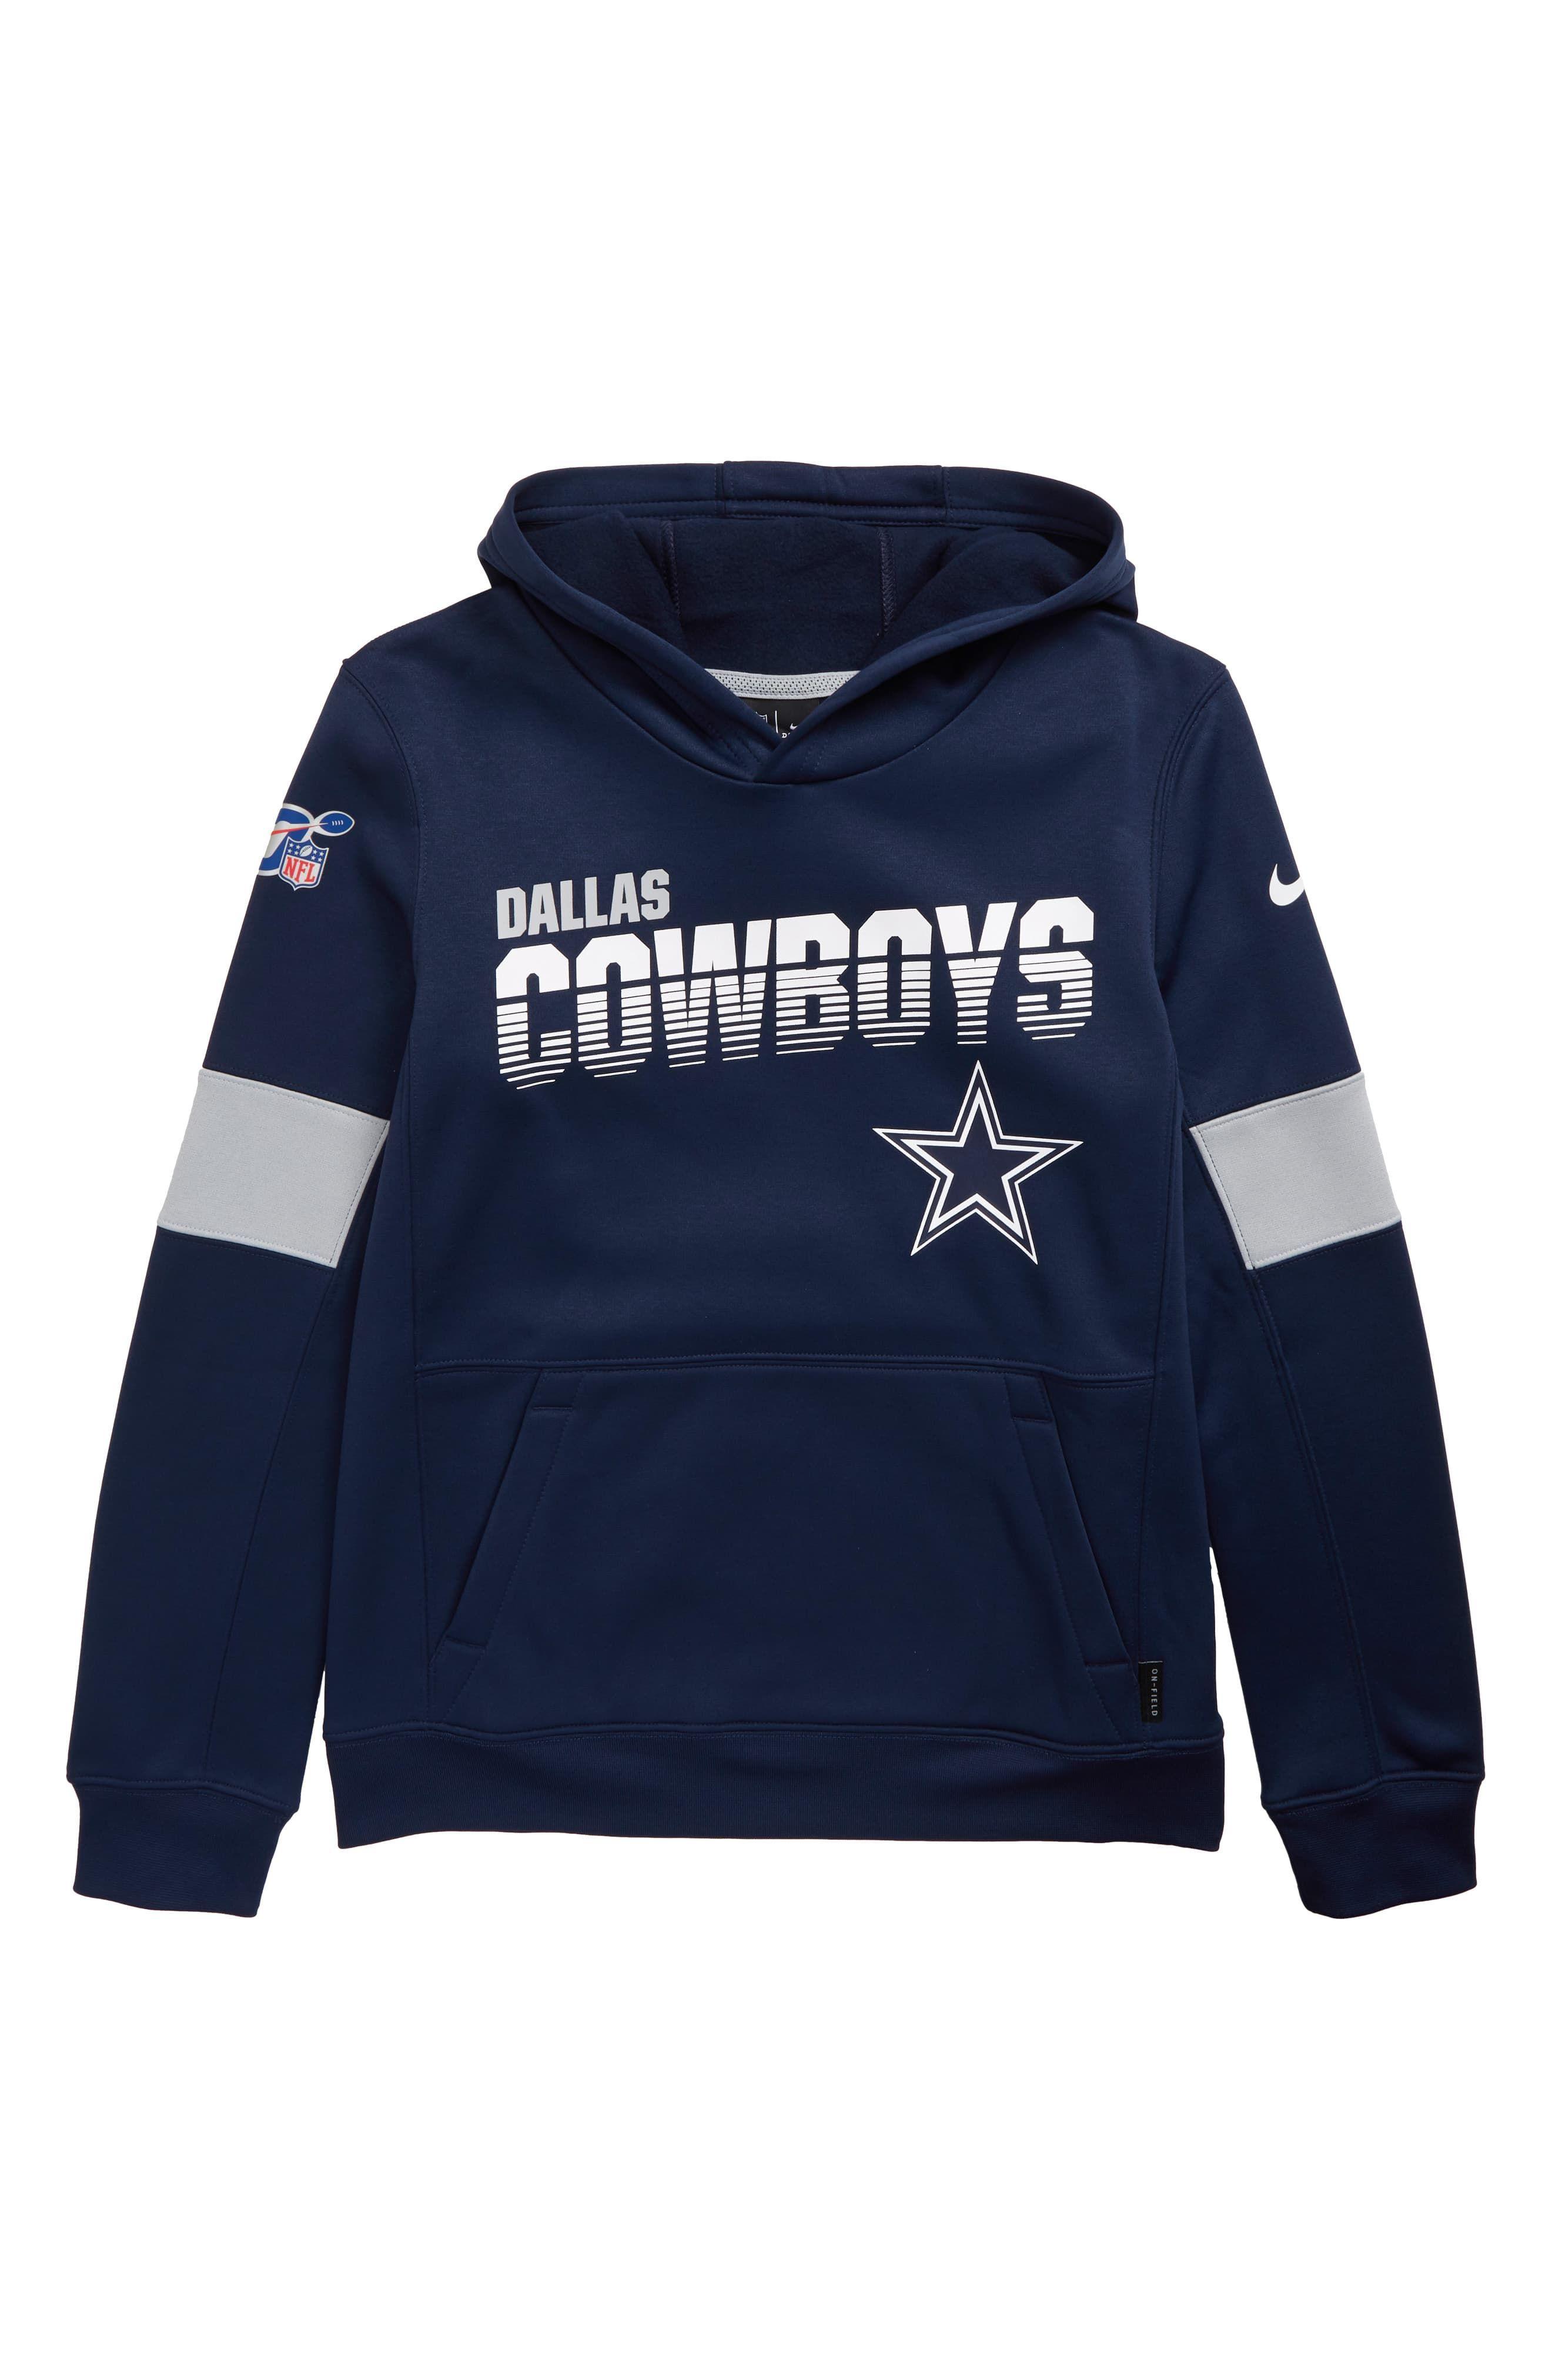 Nike Nfl Logo Dallas Cowboys Therma Hoodie Big Boys Nordstrom Dallas Cowboys Nfl Logo Nike Nfl [ 4048 x 2640 Pixel ]